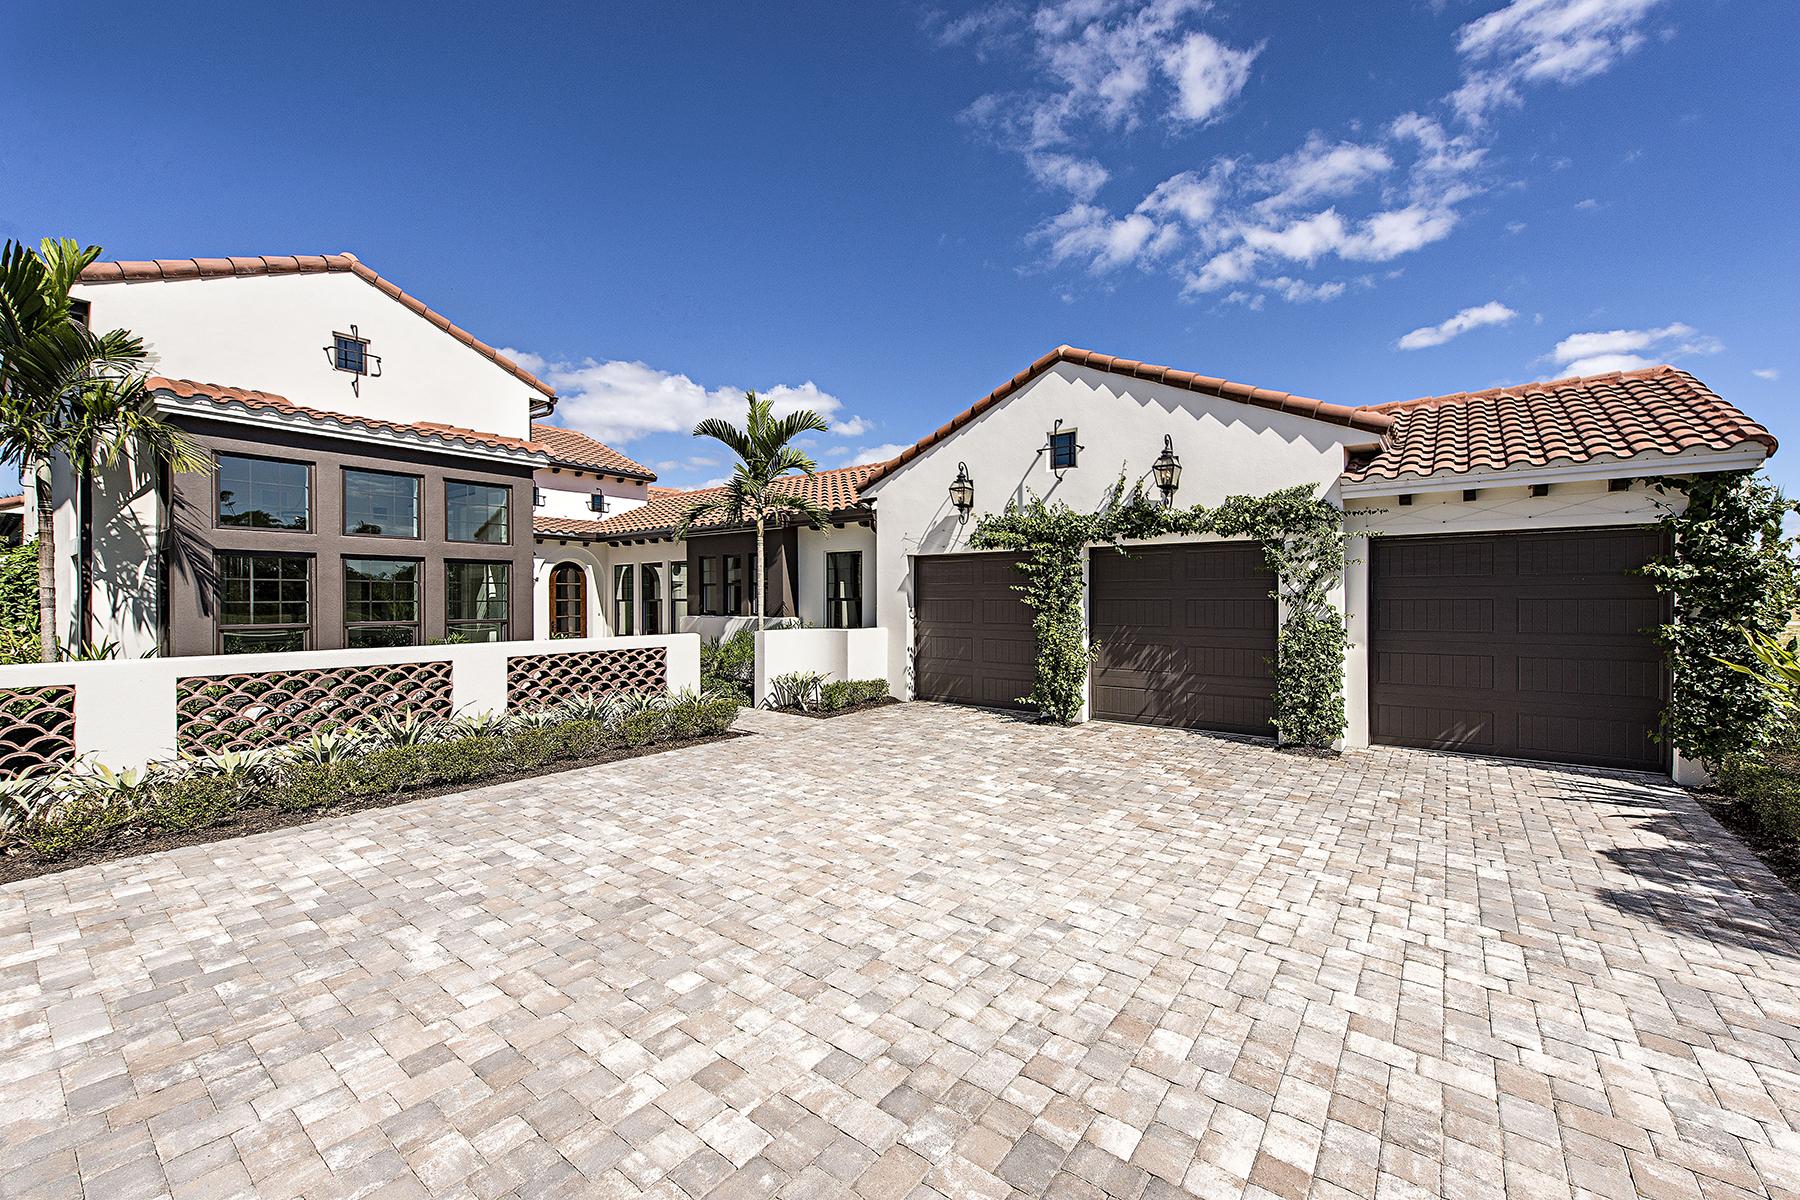 Single Family Home for Sale at FIDDLERS' CREEK - MARSH COVE 3255 Tavolara Ln, Naples, Florida 34114 United States